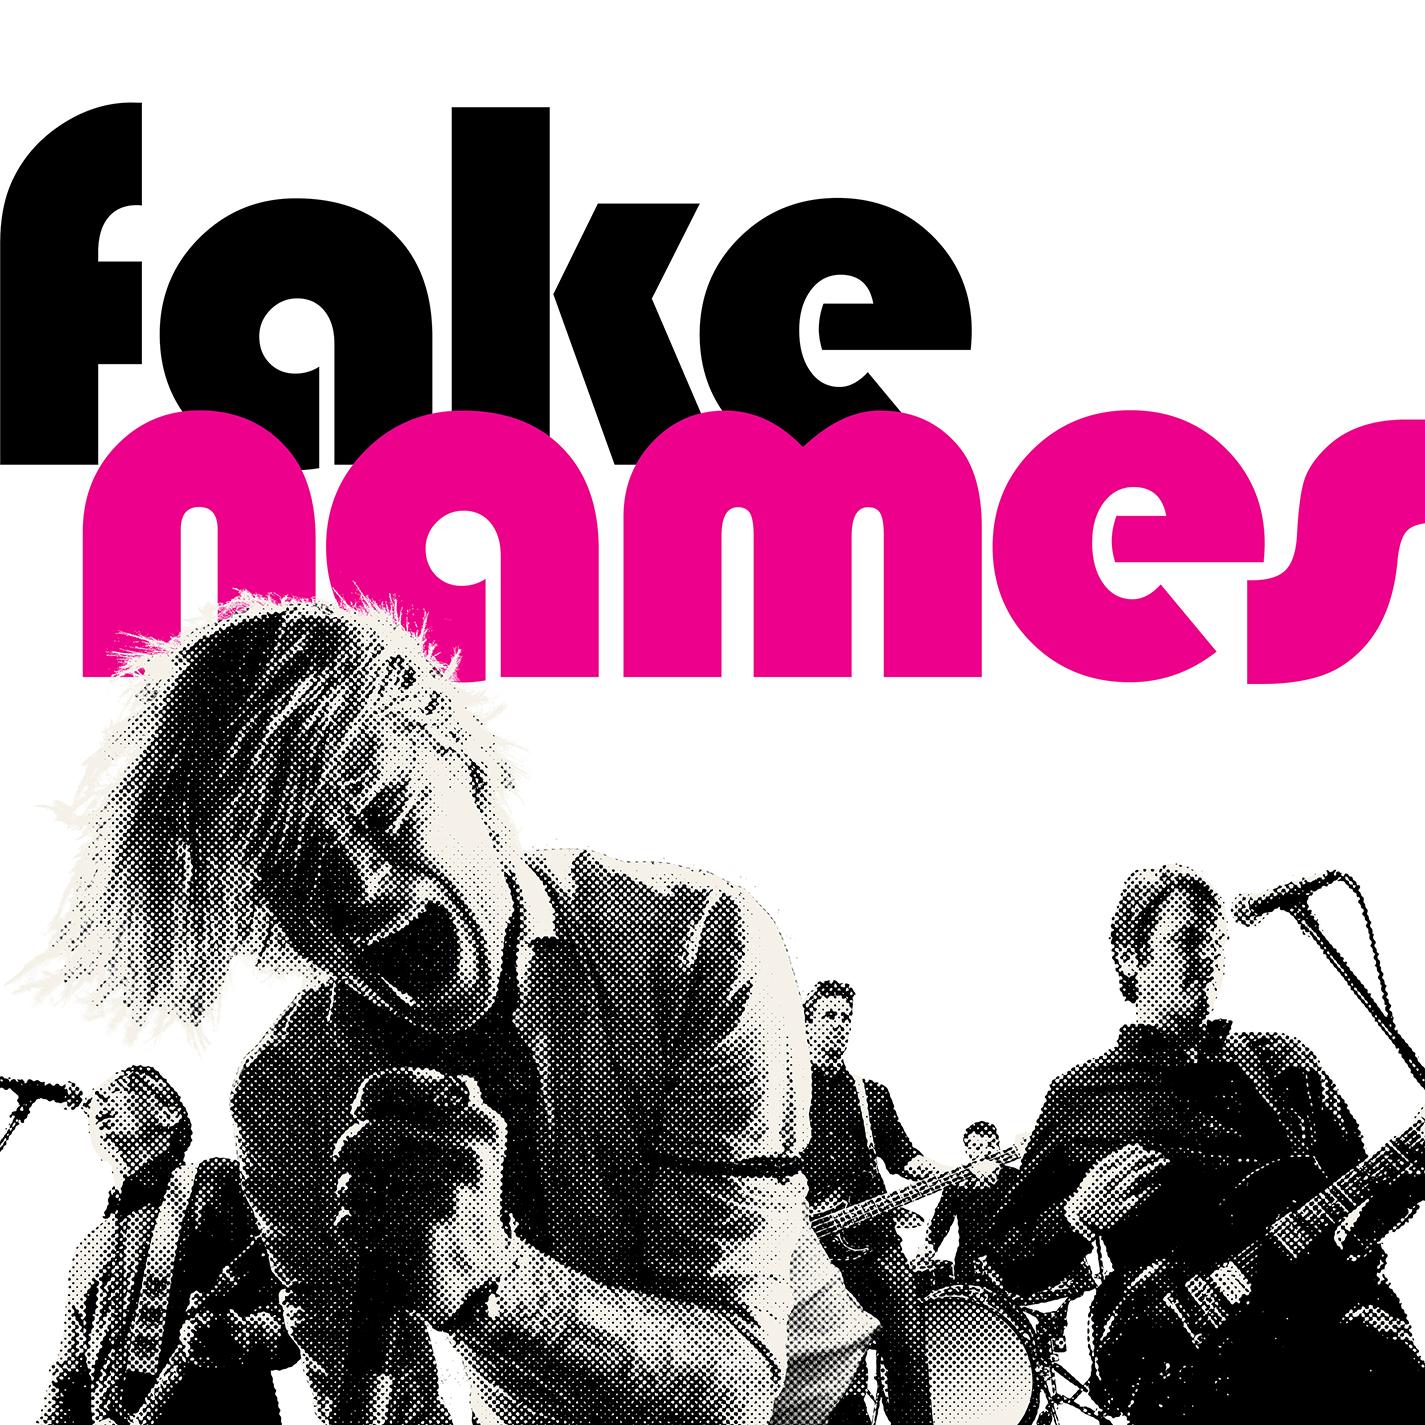 Fake Names – Fake Names (Album Review) – Wall Of Sound